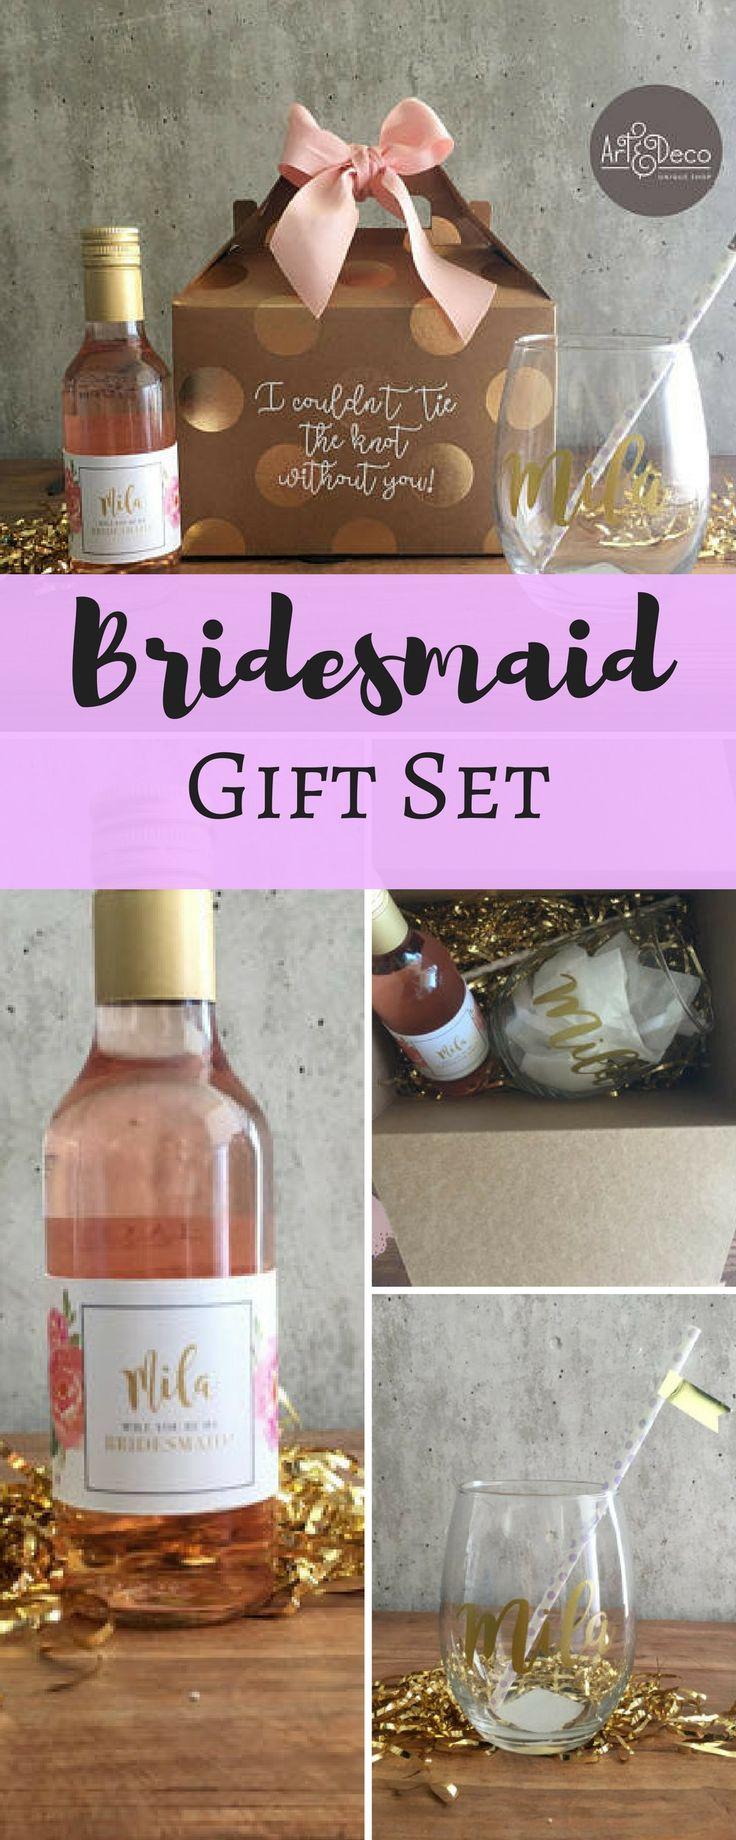 BRIDESMAID GIFT SET / Custom Gifts / Name Glass / Wine kit / Bridesmaid kit / Bridal Shower / Bachelorette / Wedding / Bridesmaid proposal #Affiliate #weddings #gifts